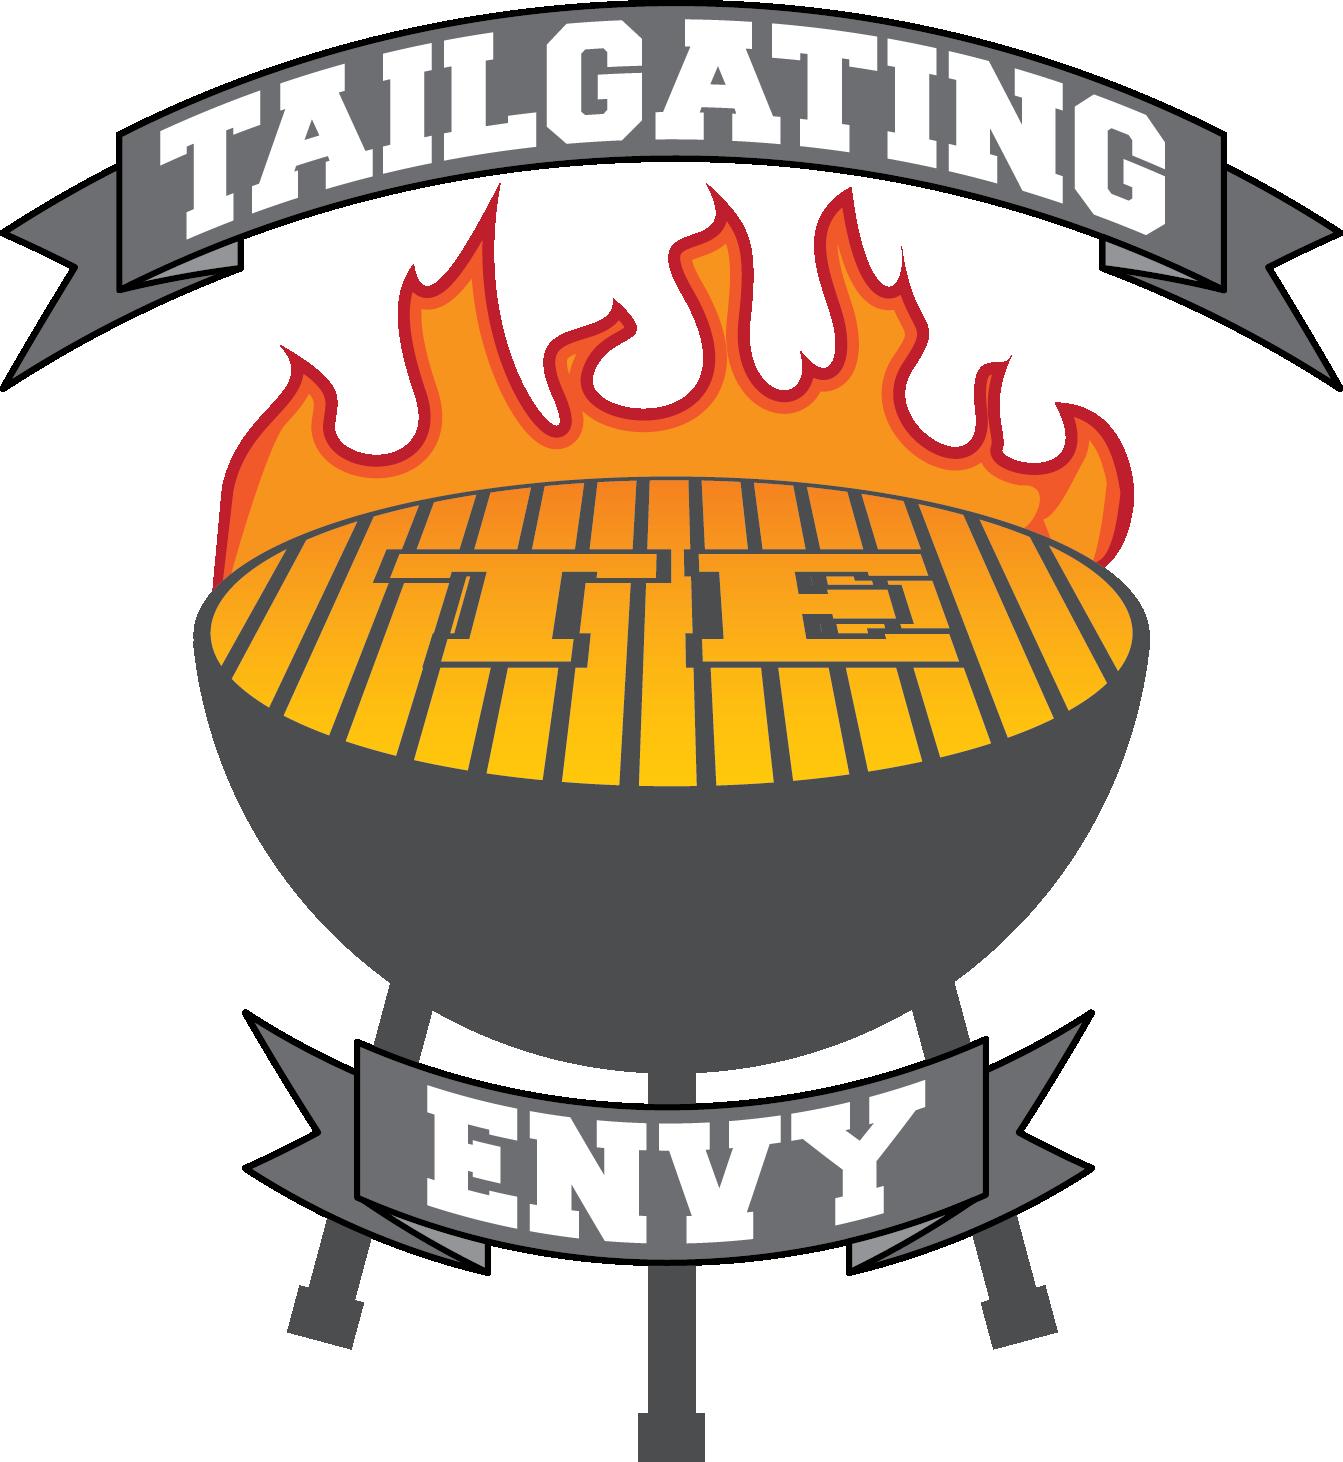 Tailgating Envy